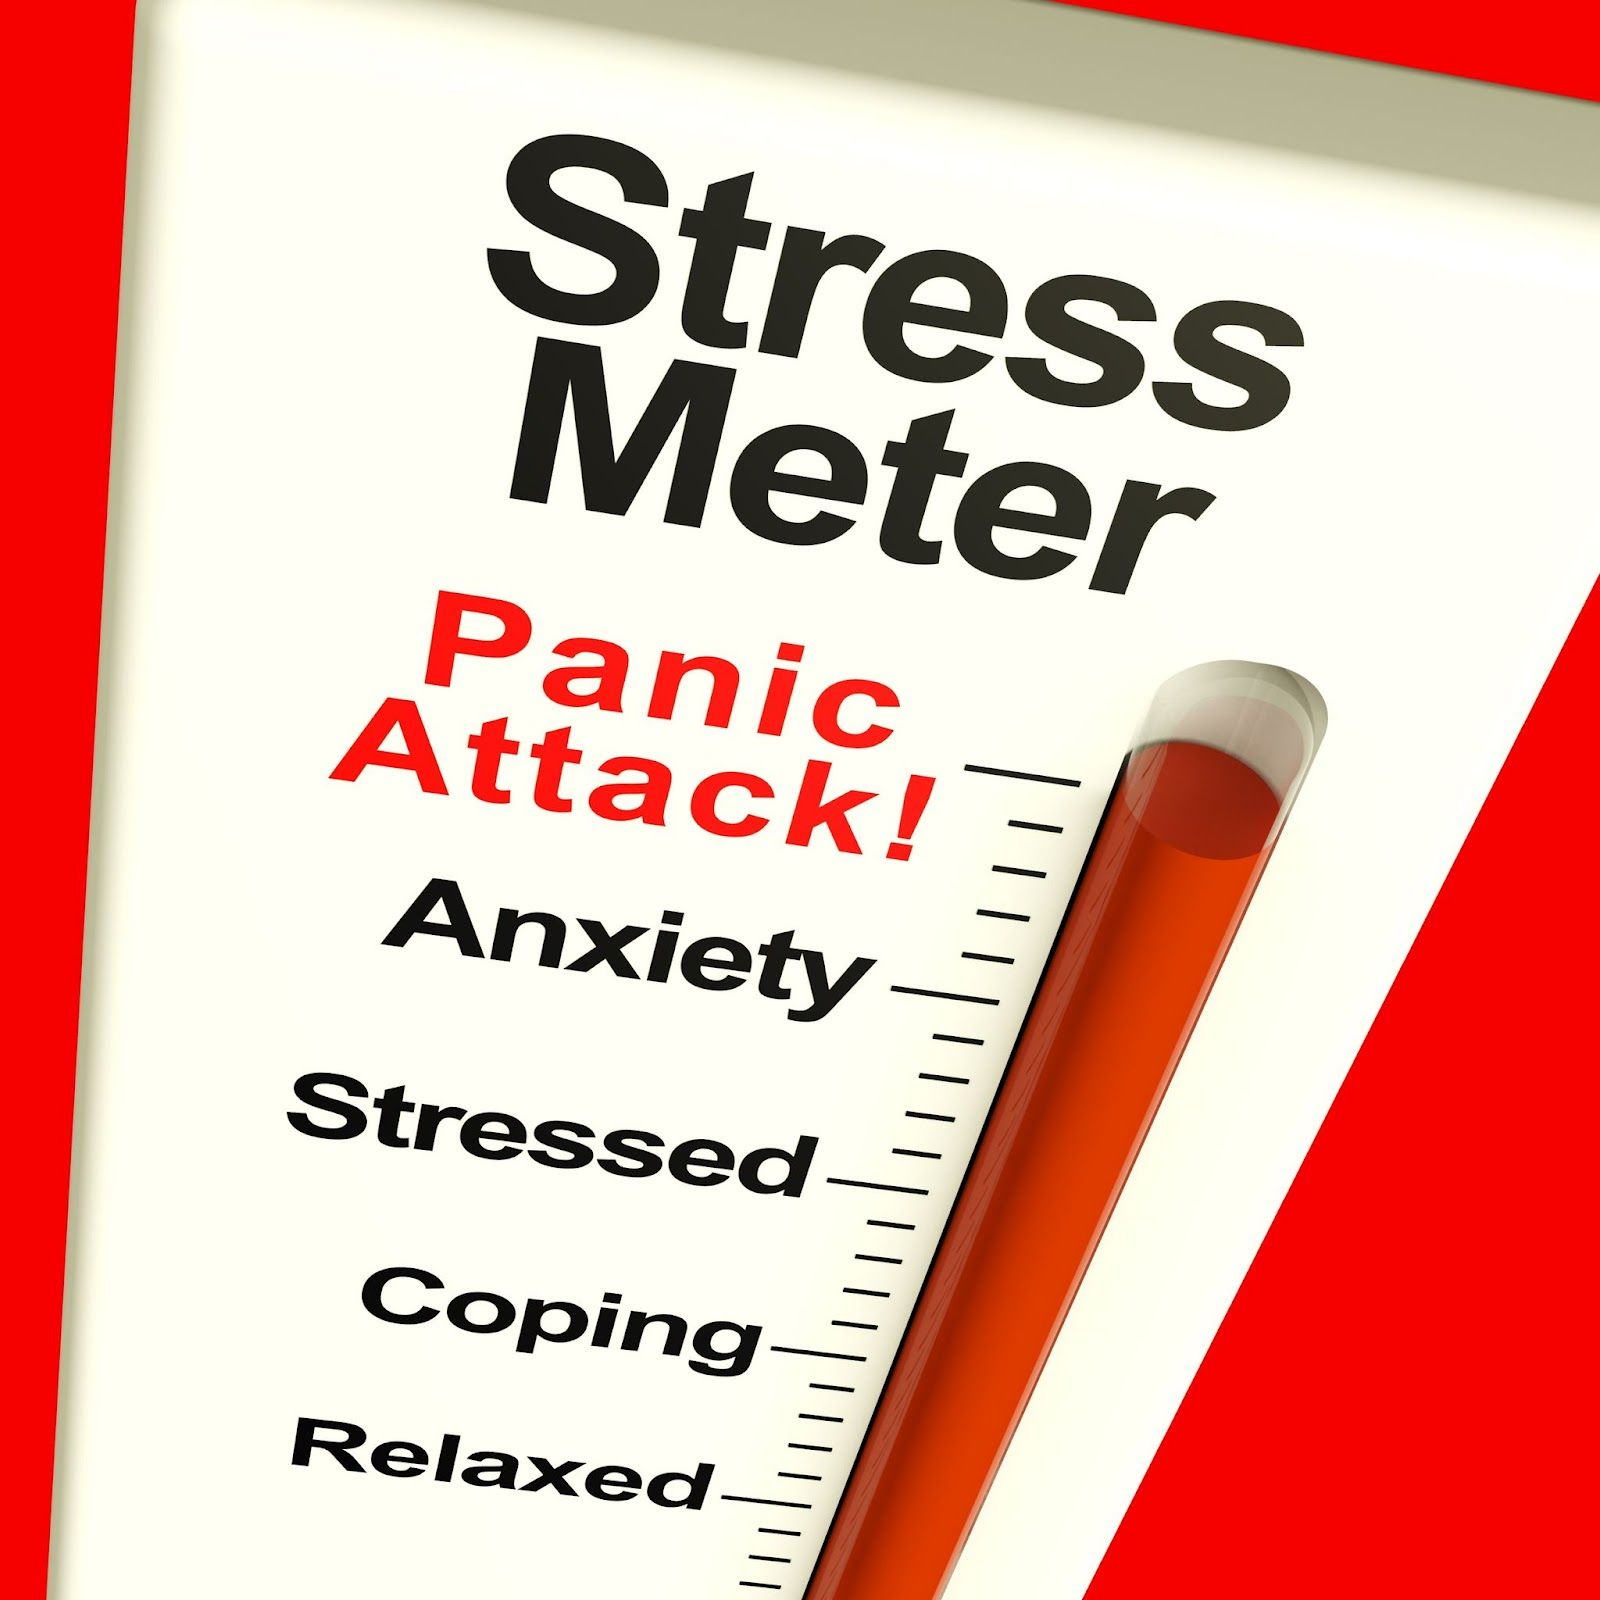 anxiety | What social anxiety | Social Anxiety Test